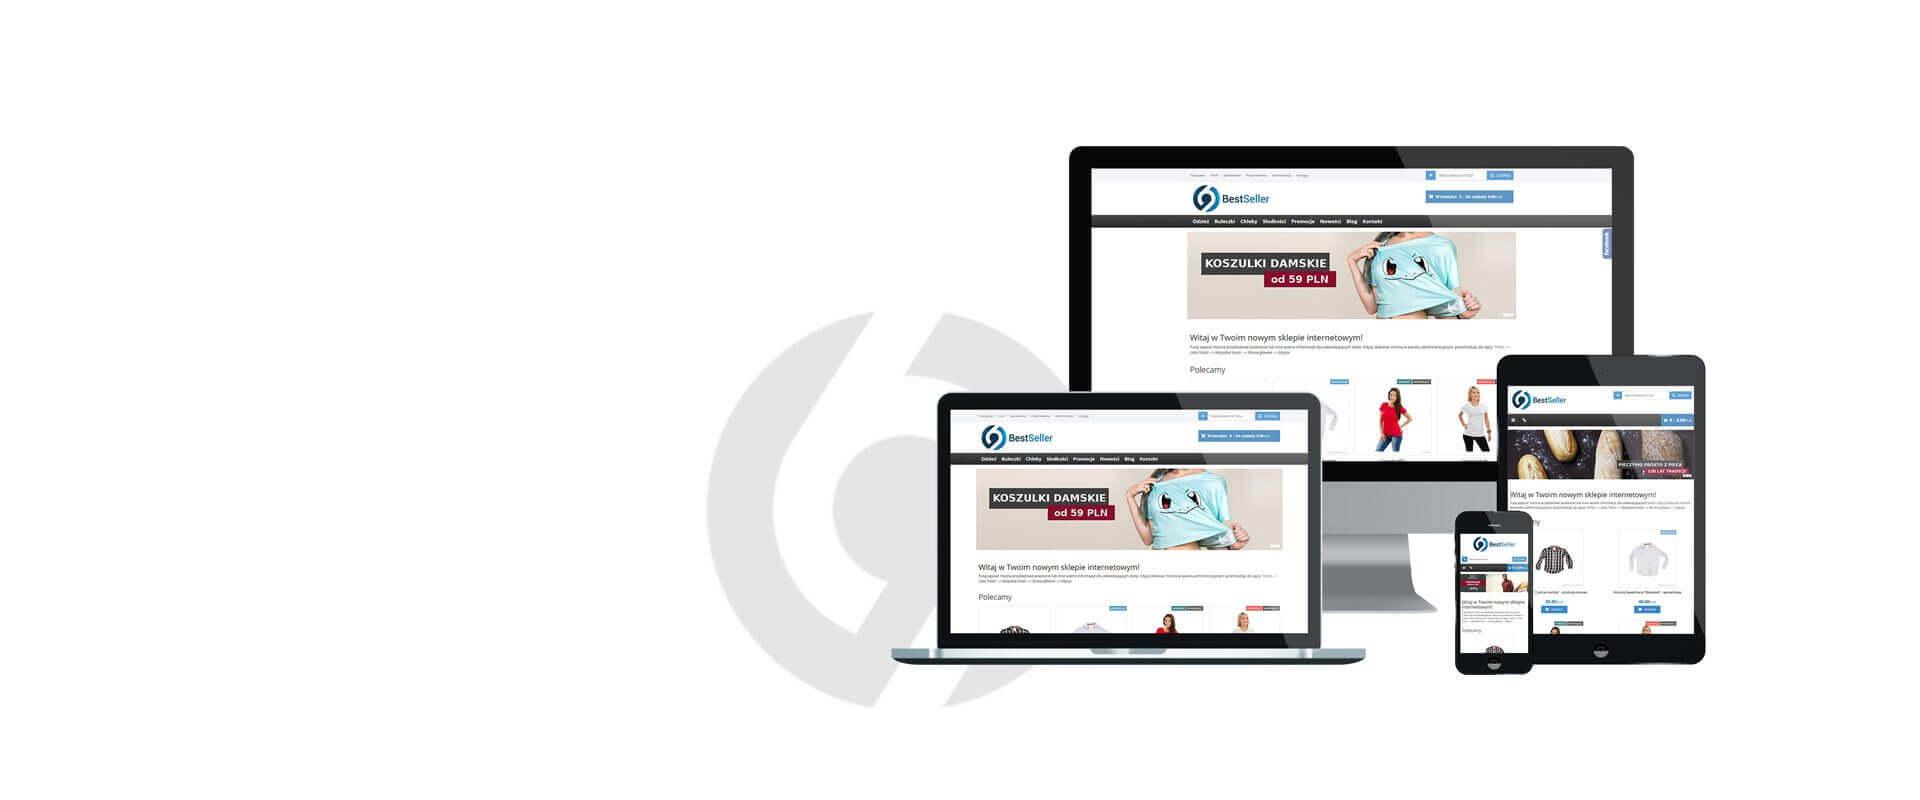 cad0ecf93953a Oprogramowanie sklepu internetowego - program BestSeller ®